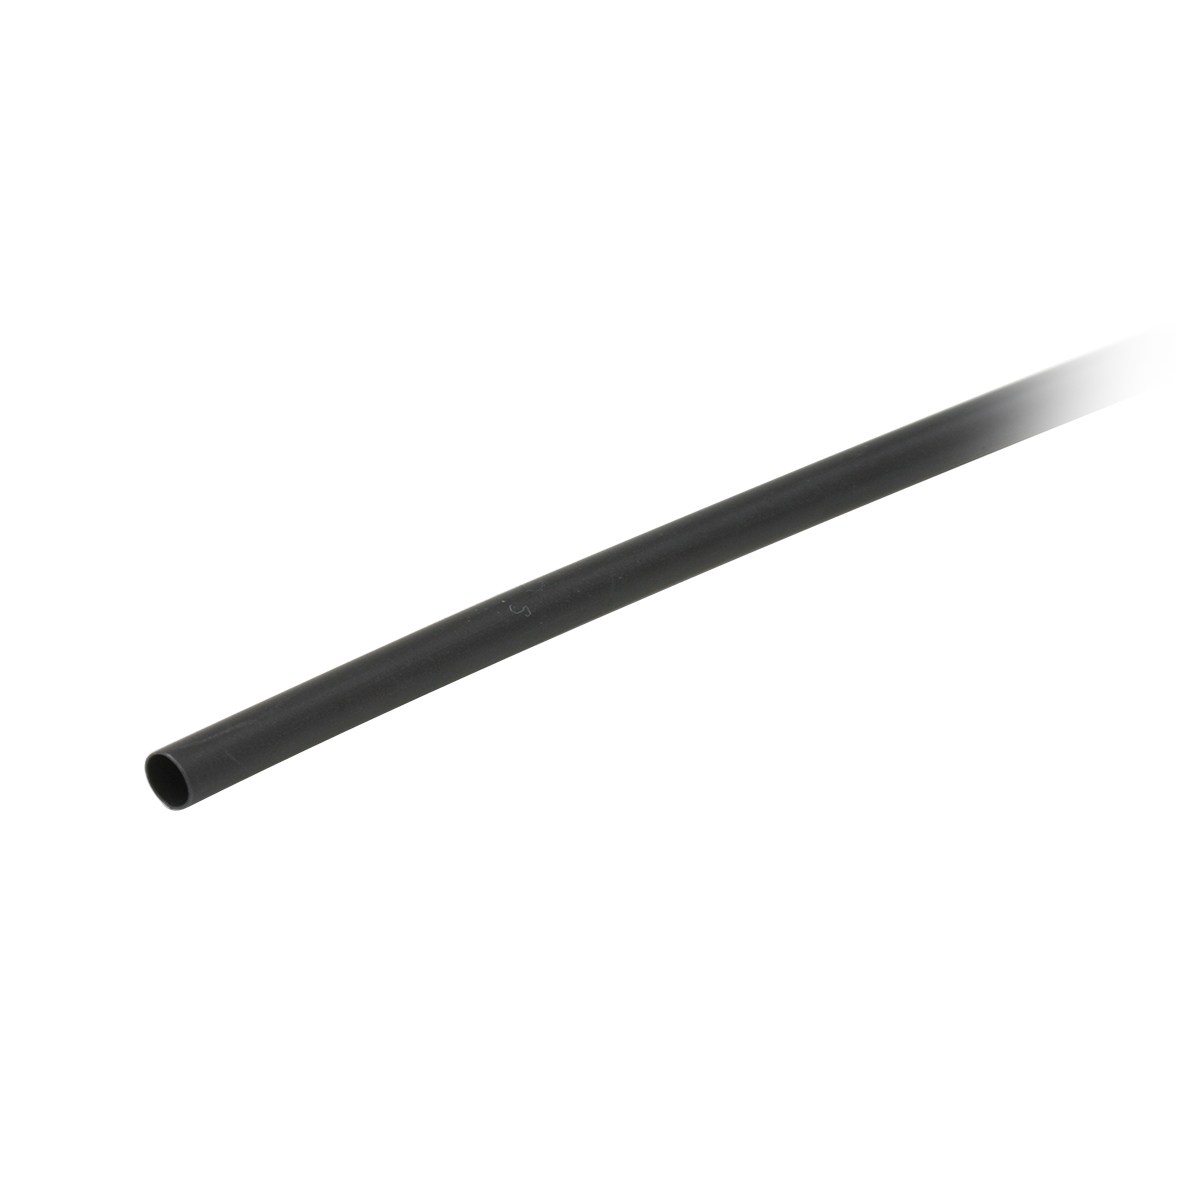 Black Polyolefin Heat Shrink Tubing